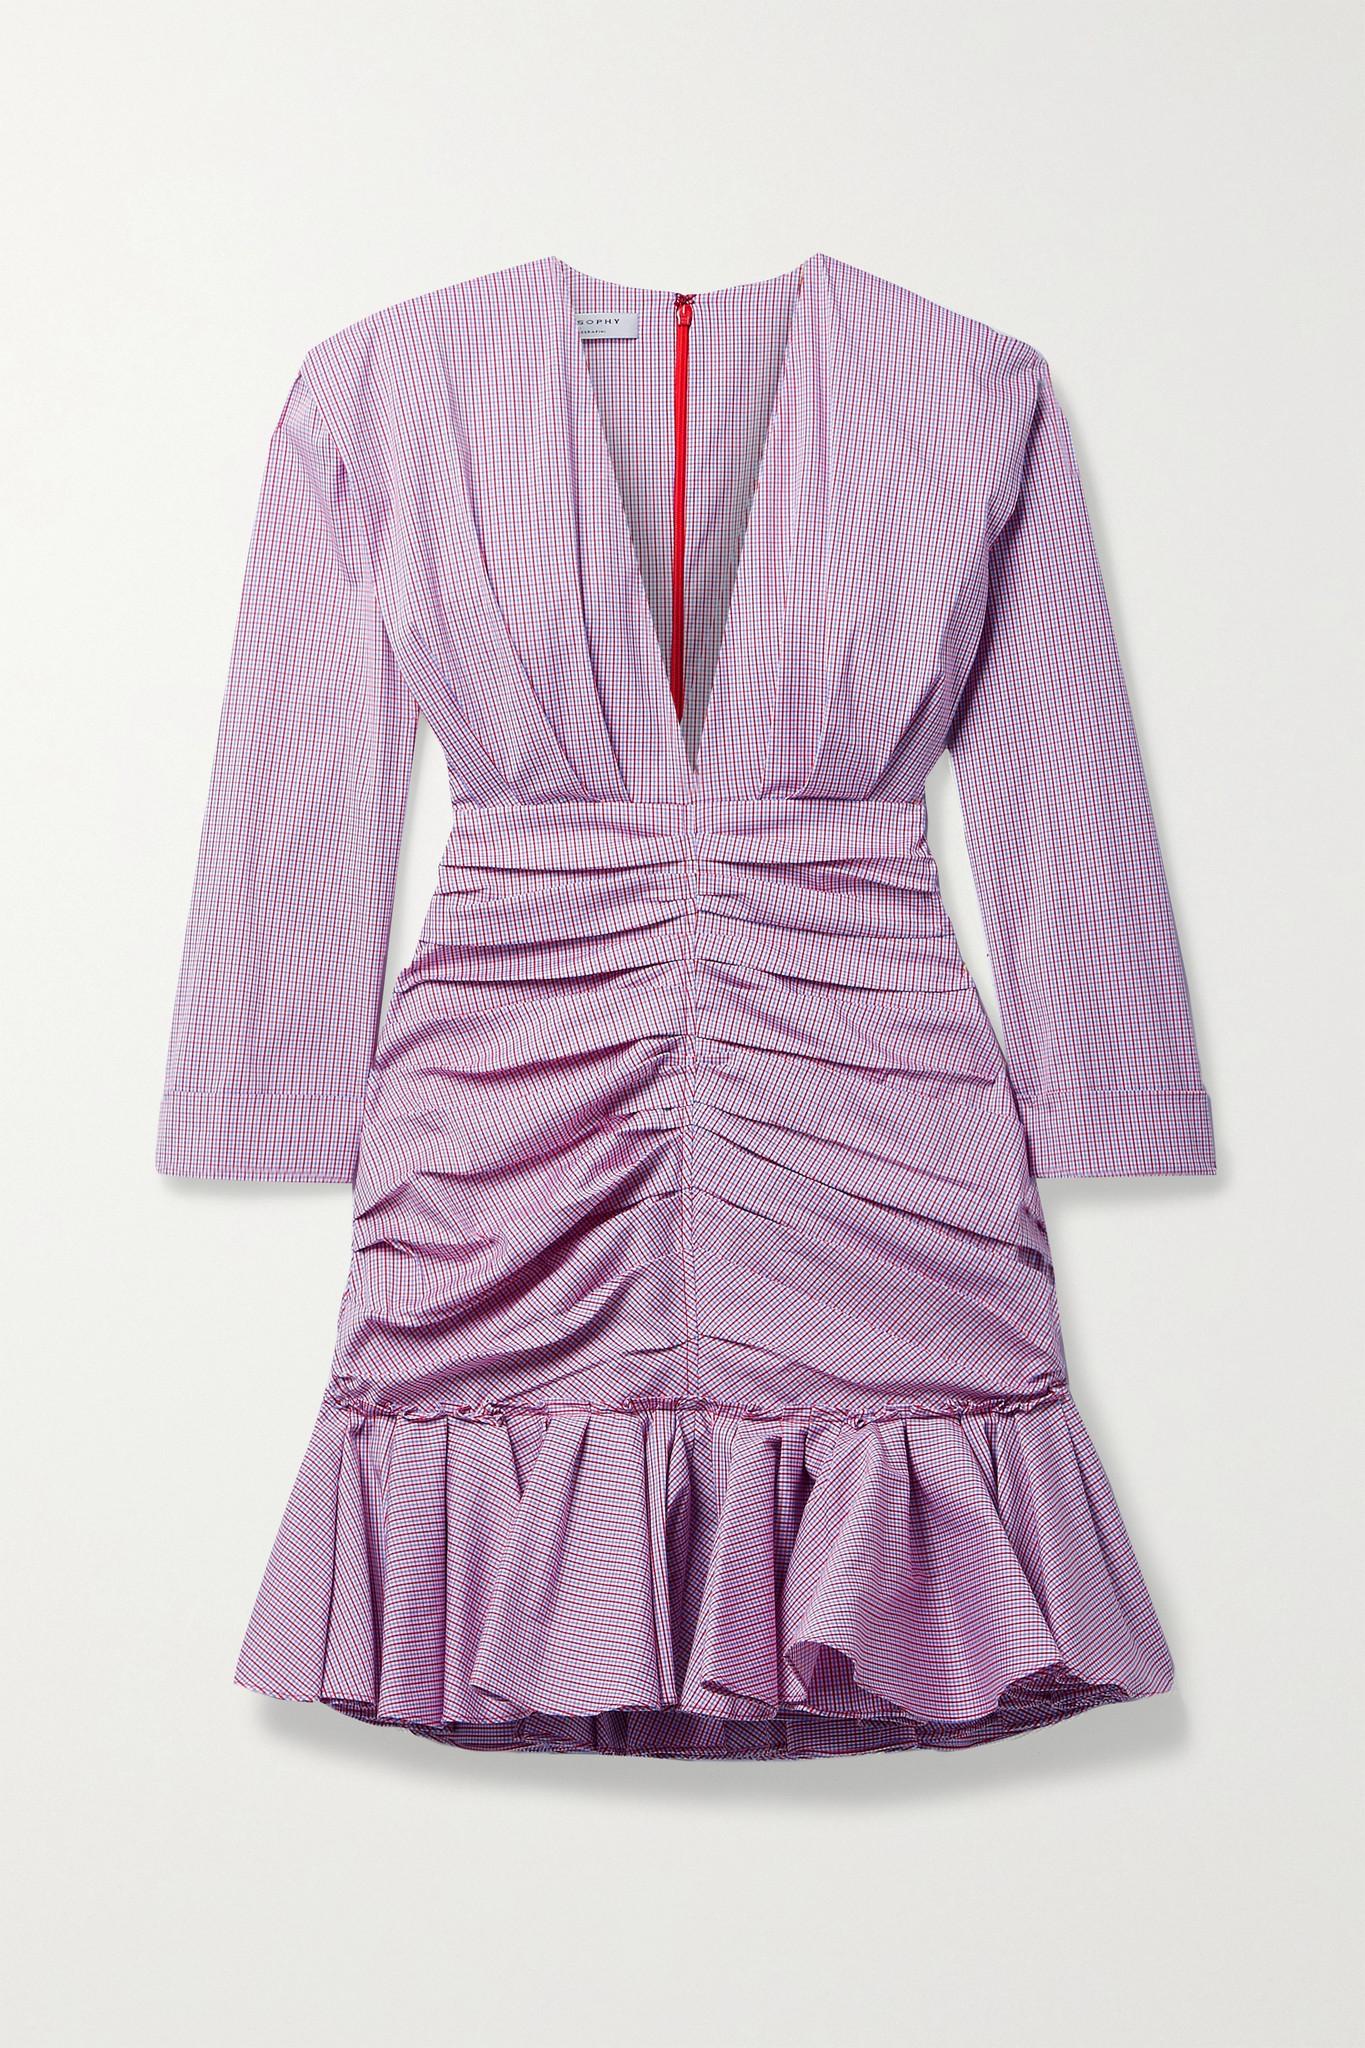 PHILOSOPHY DI LORENZO SERAFINI - 缩褶格纹棉质混纺府绸迷你连衣裙 - 紫色 - IT40